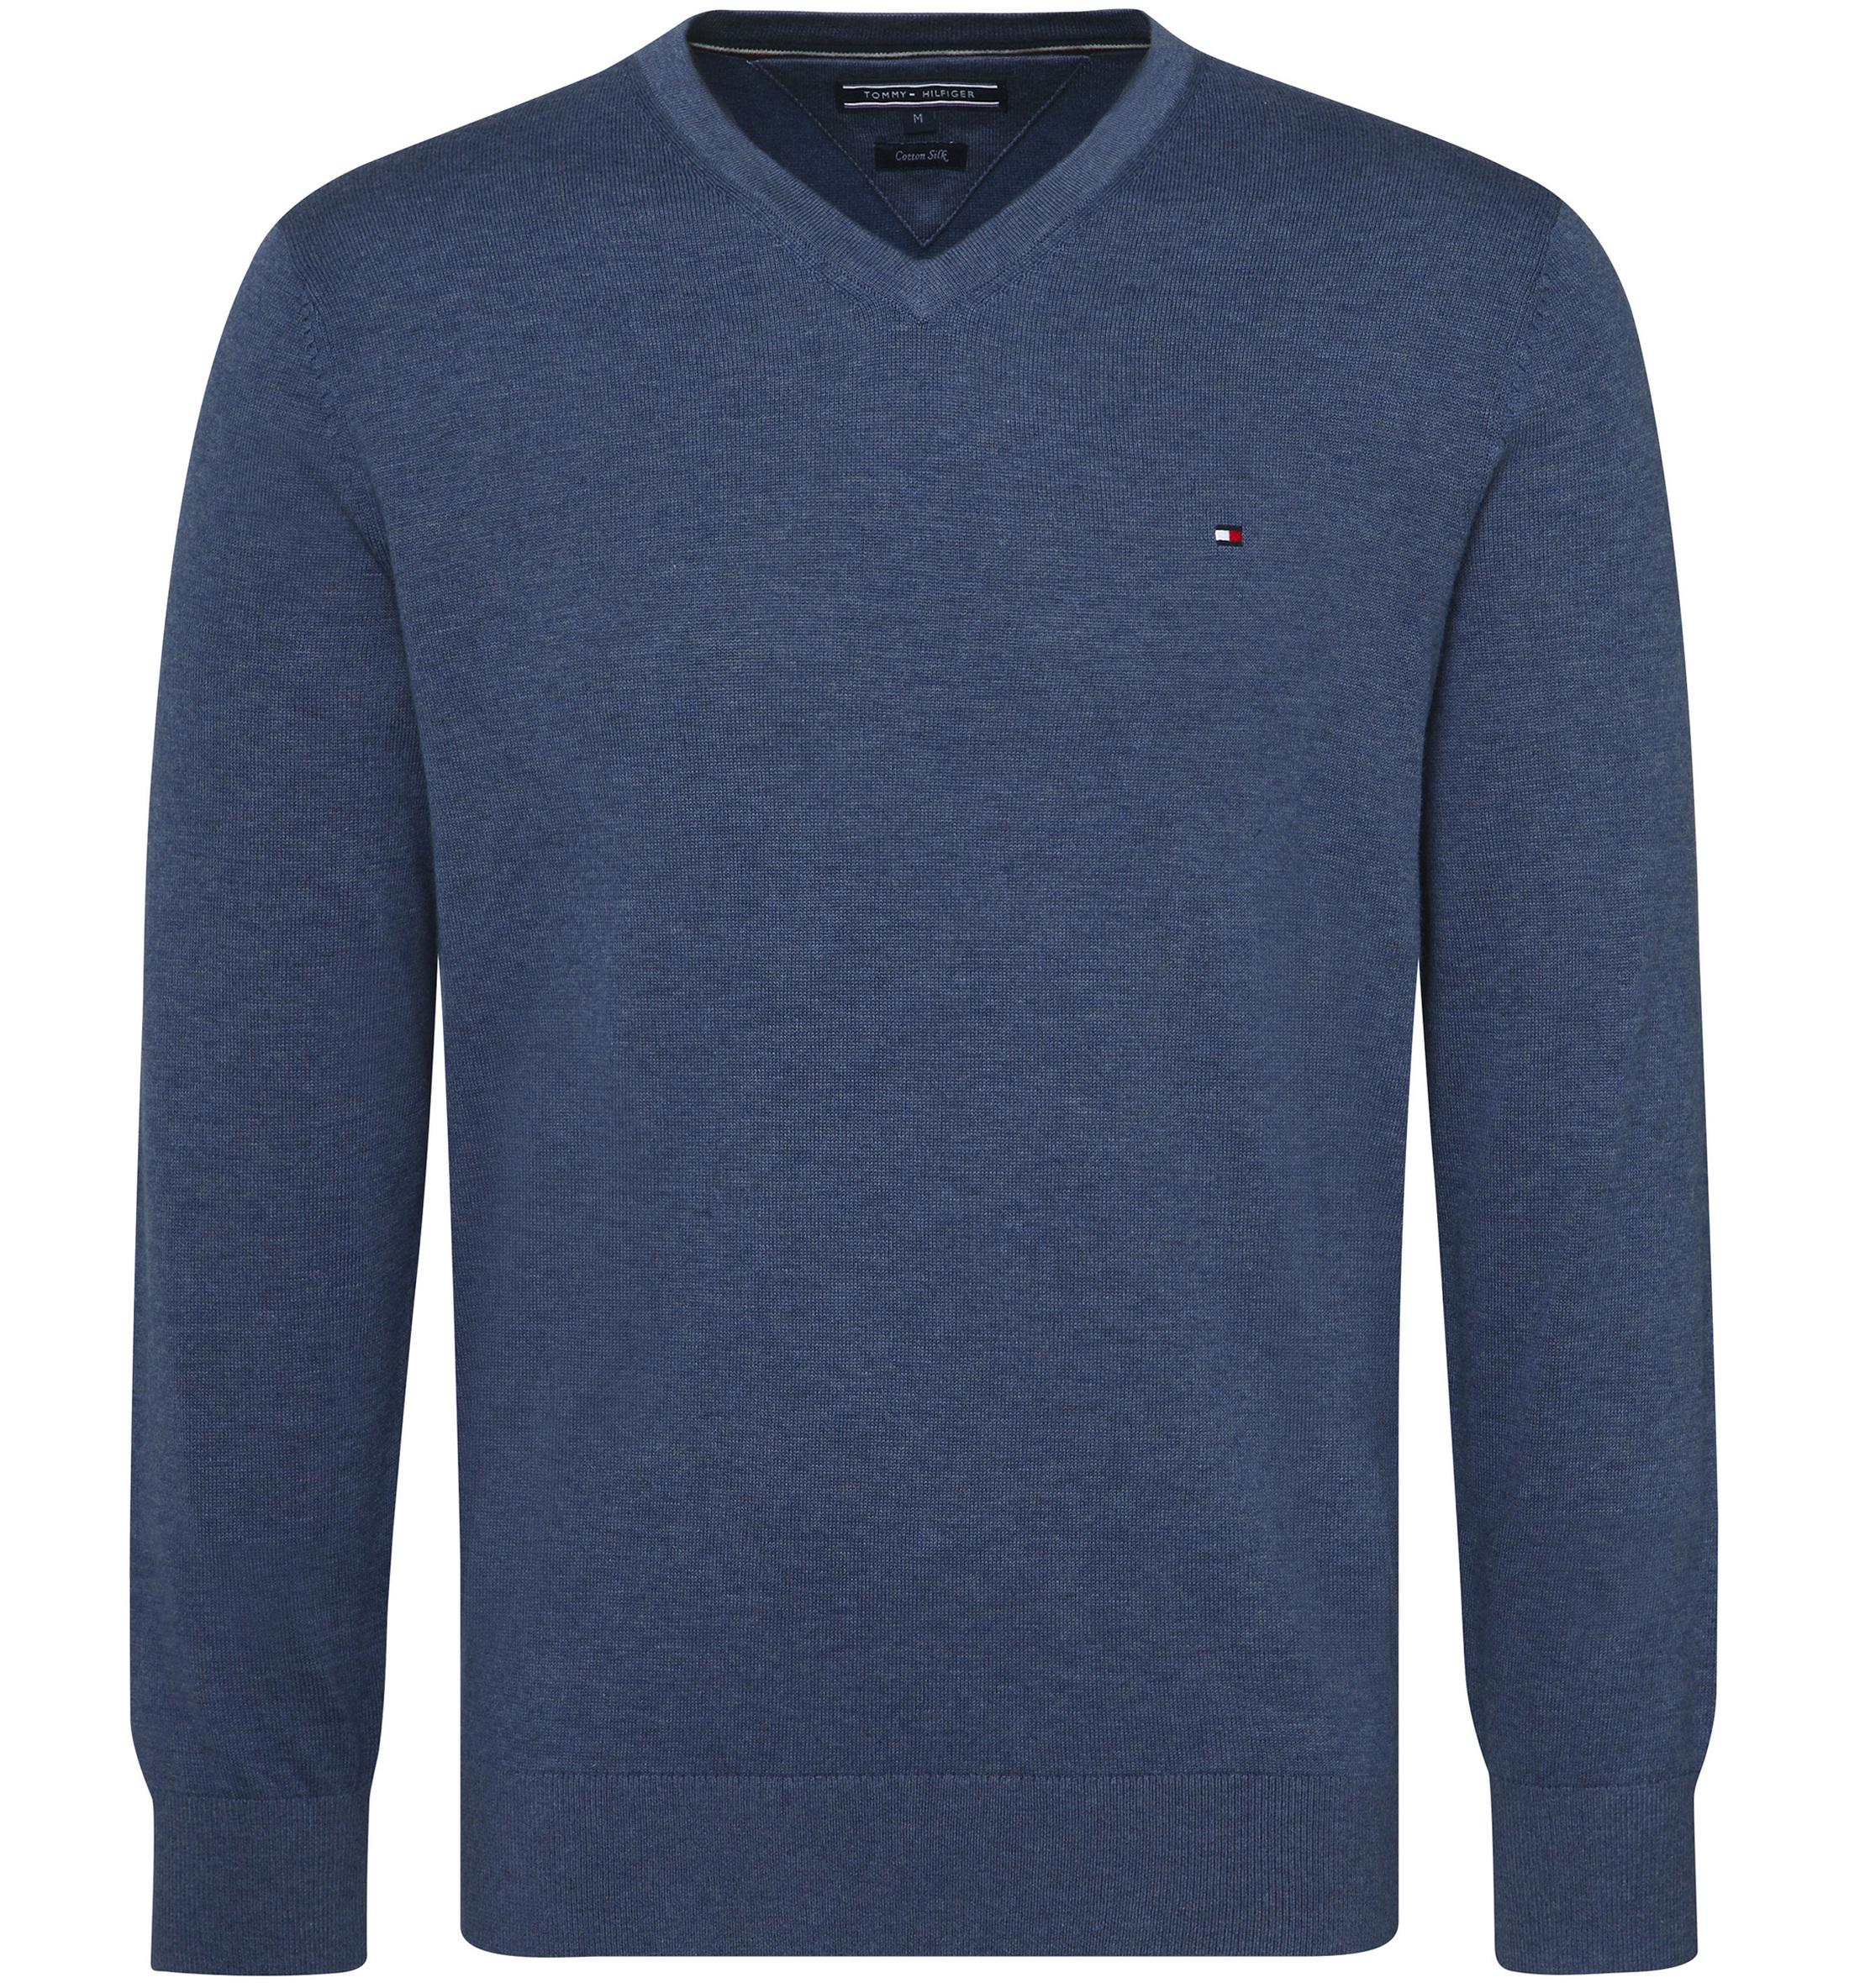 b80106f94 Tommy Hilfiger Pullover V-Neck Indigo Blue MW0WM07884-094 order ...